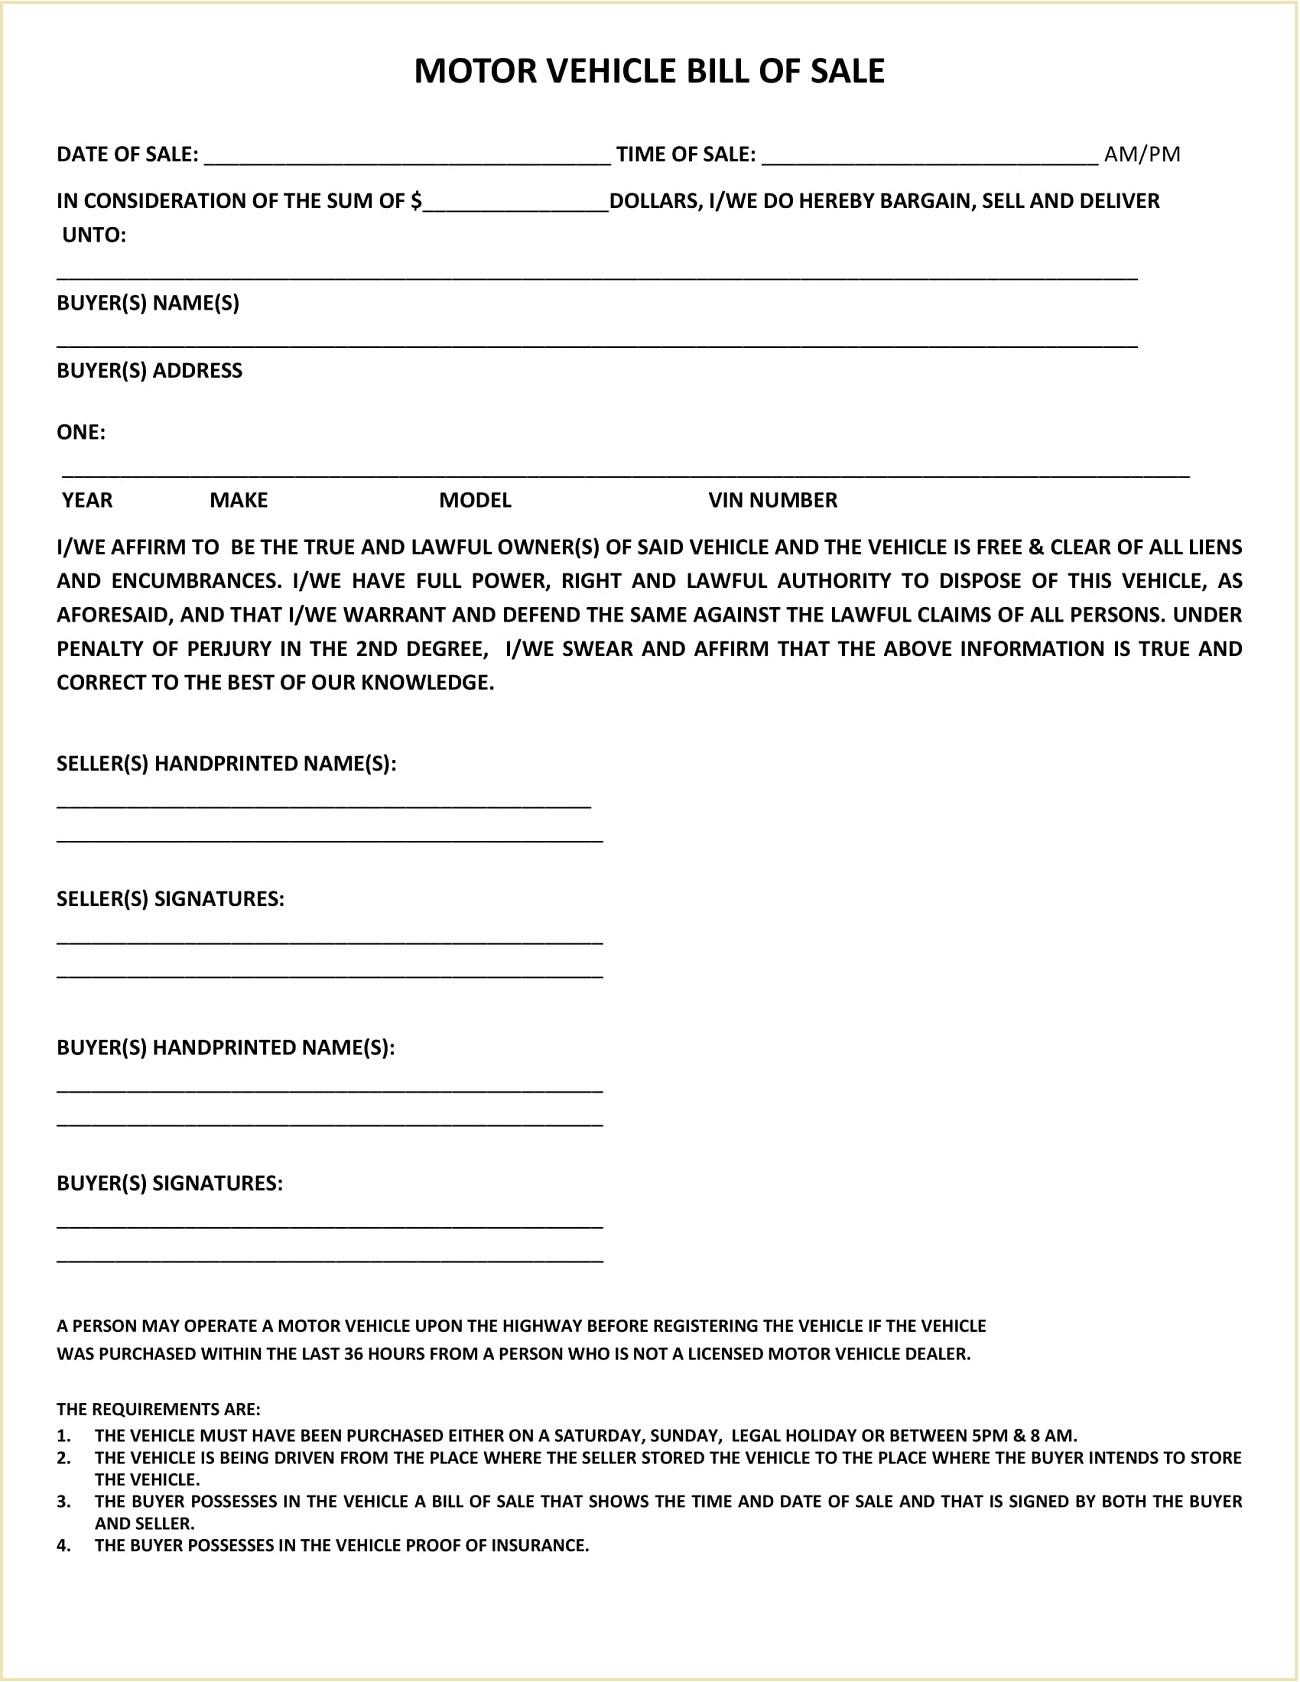 Weld County Colorado DMV Motor Vehicle Bill of Sale Form PDF